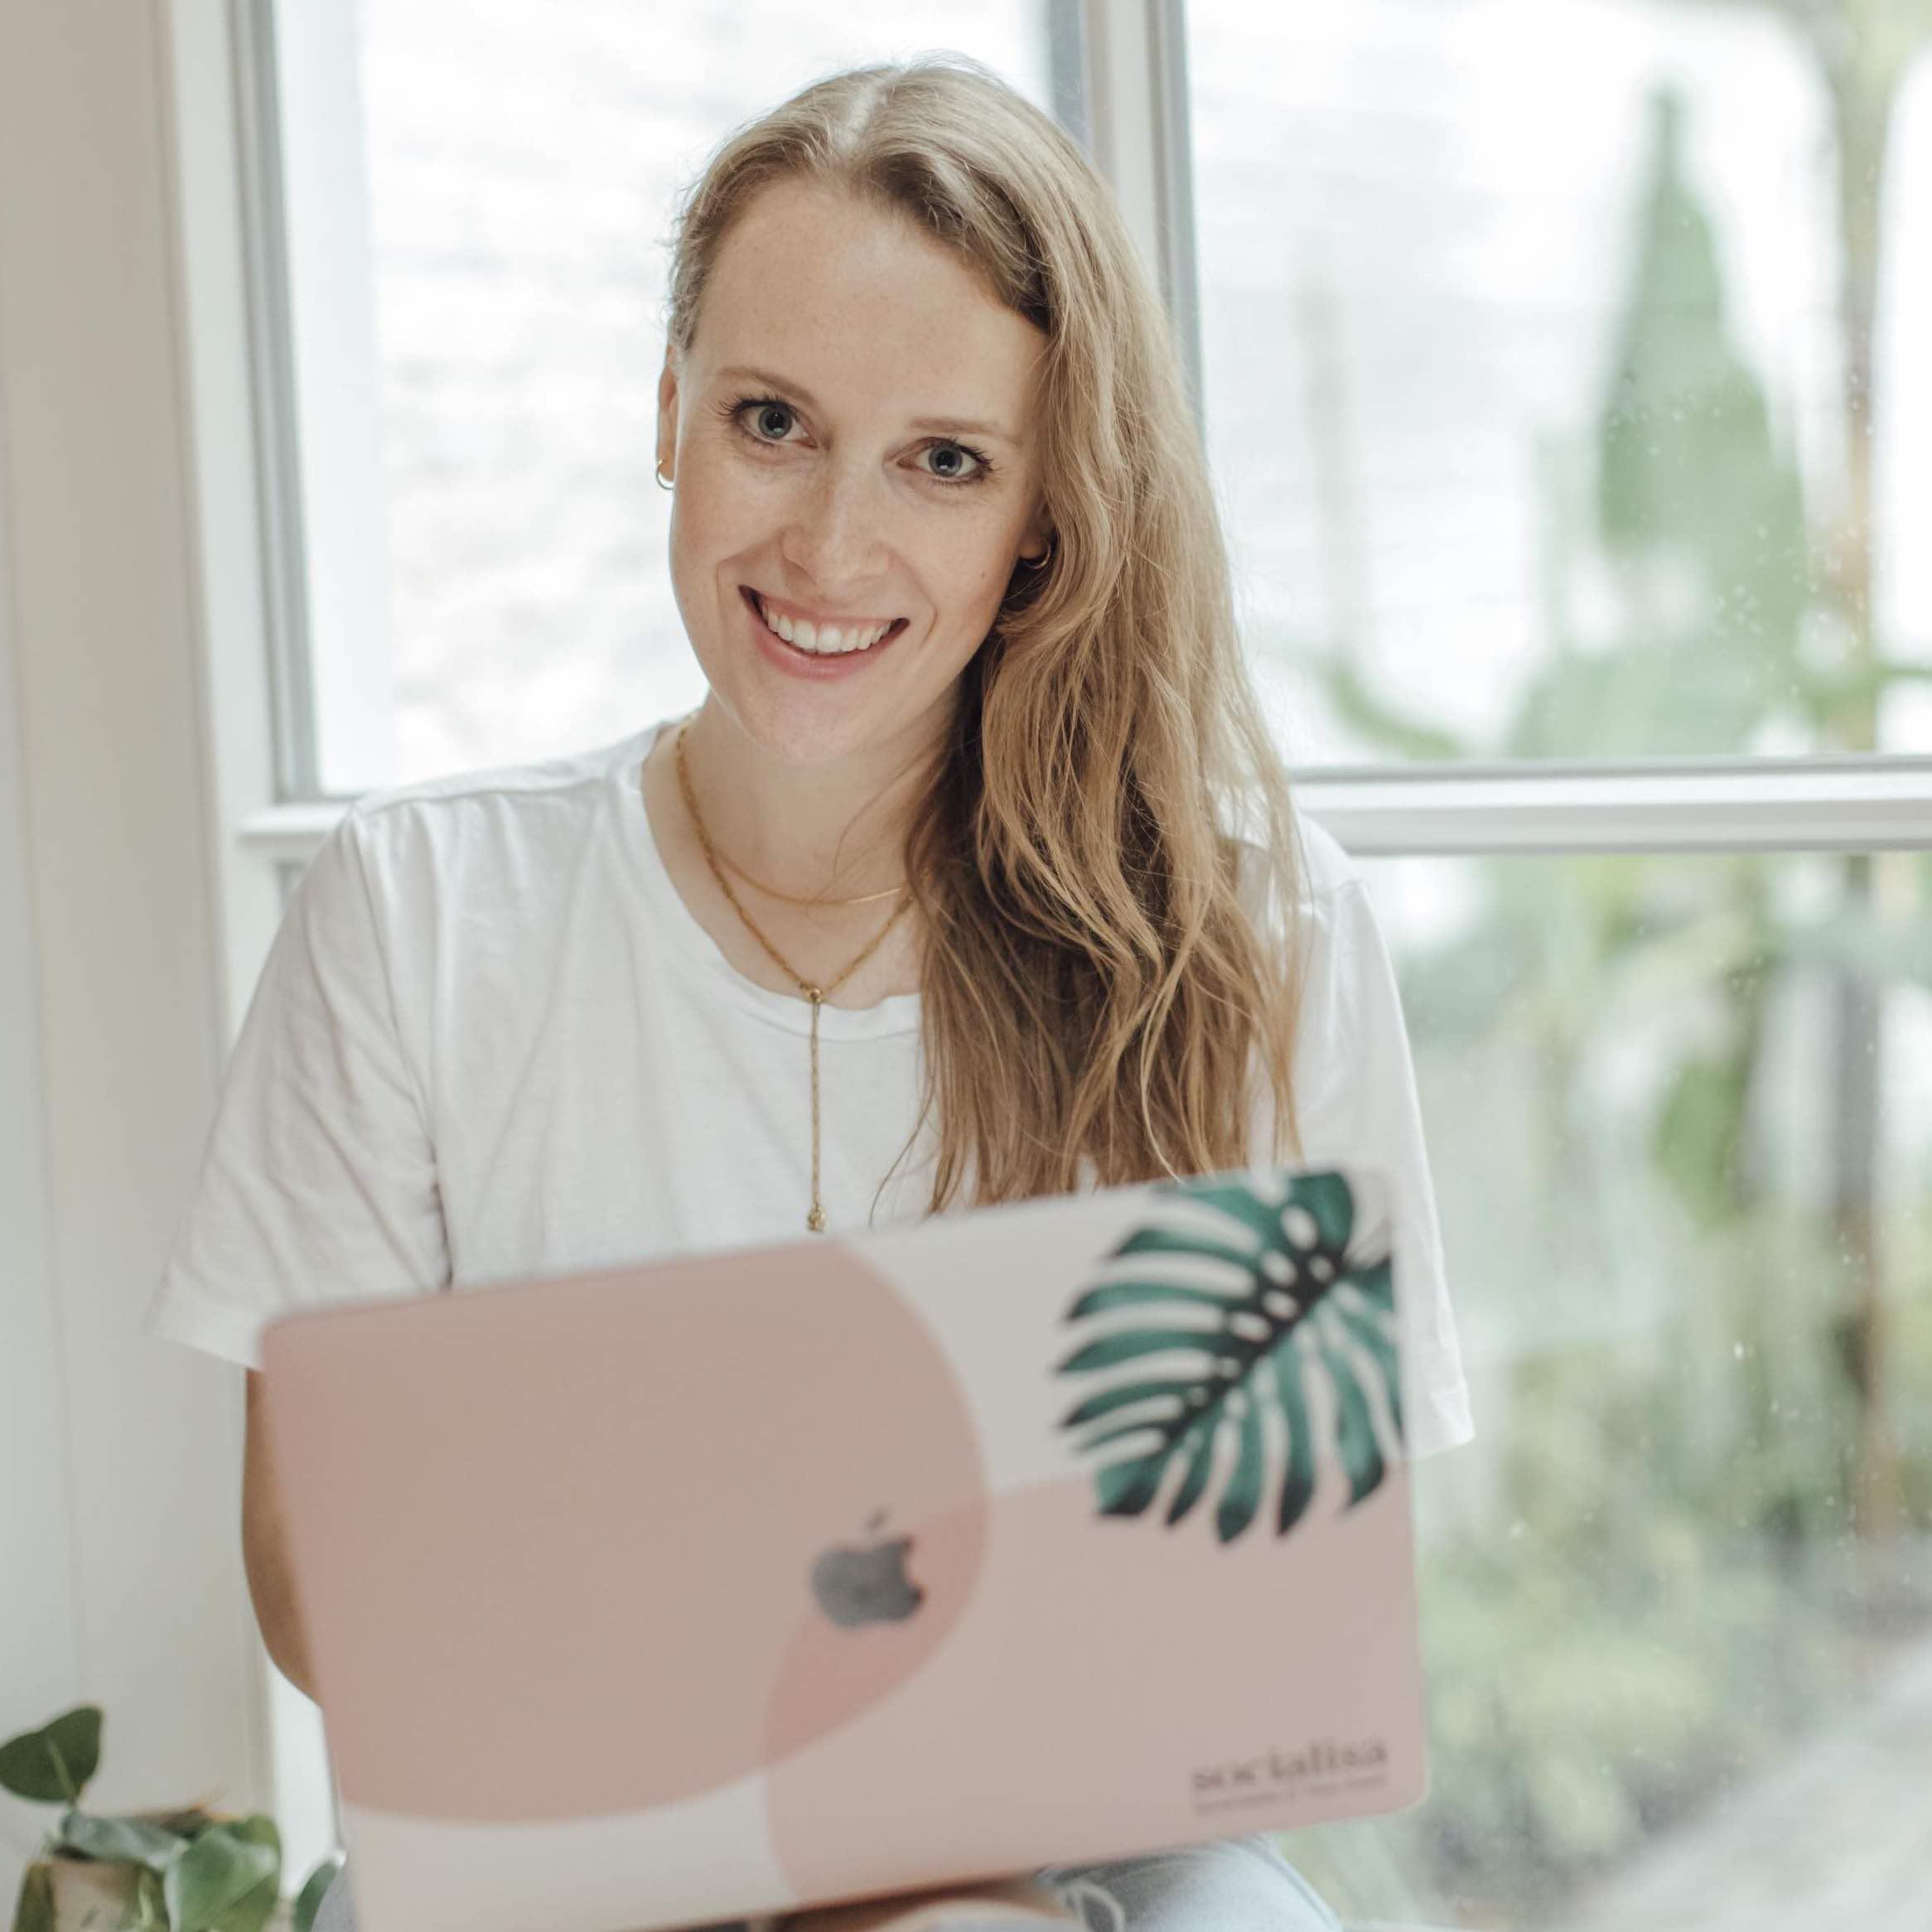 Lisa am Laptop